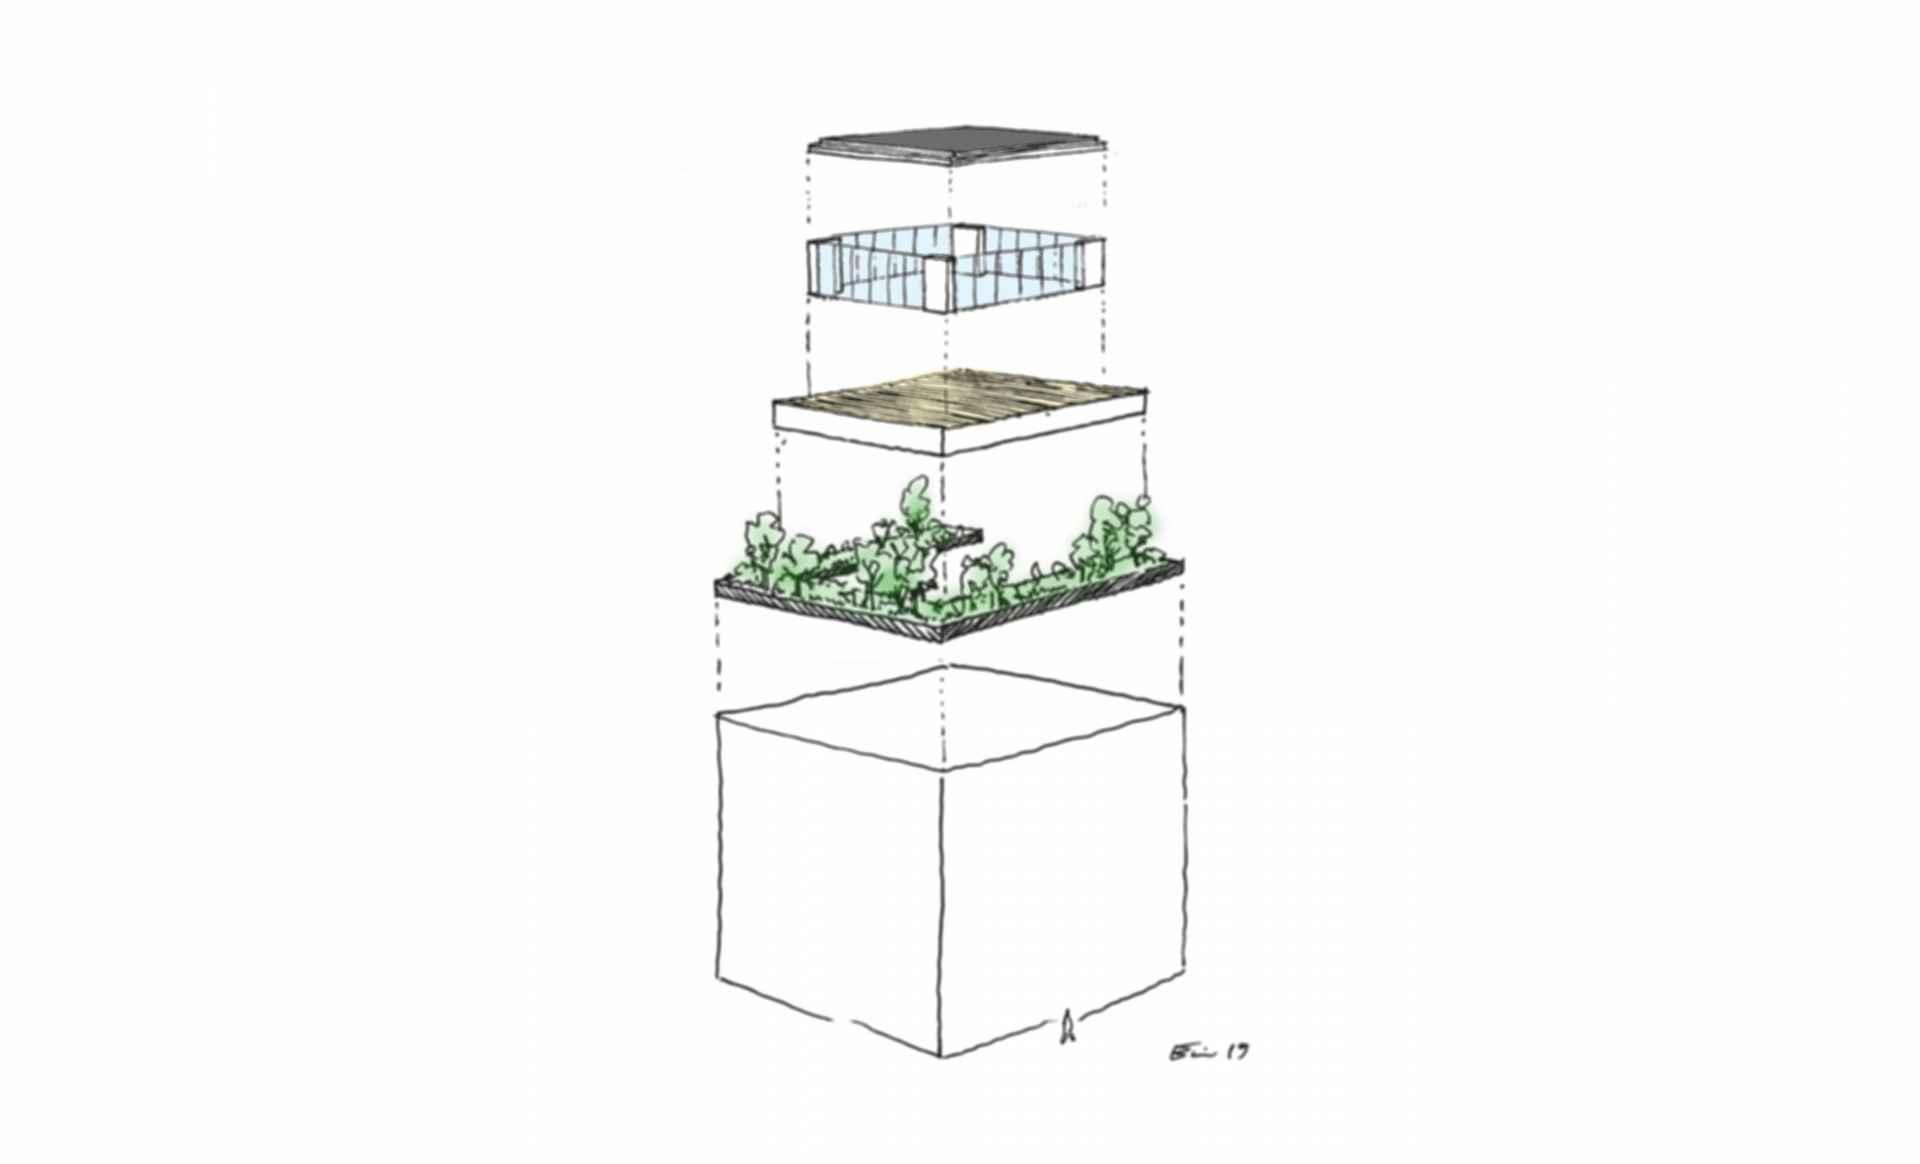 Cubo JK - Drawing